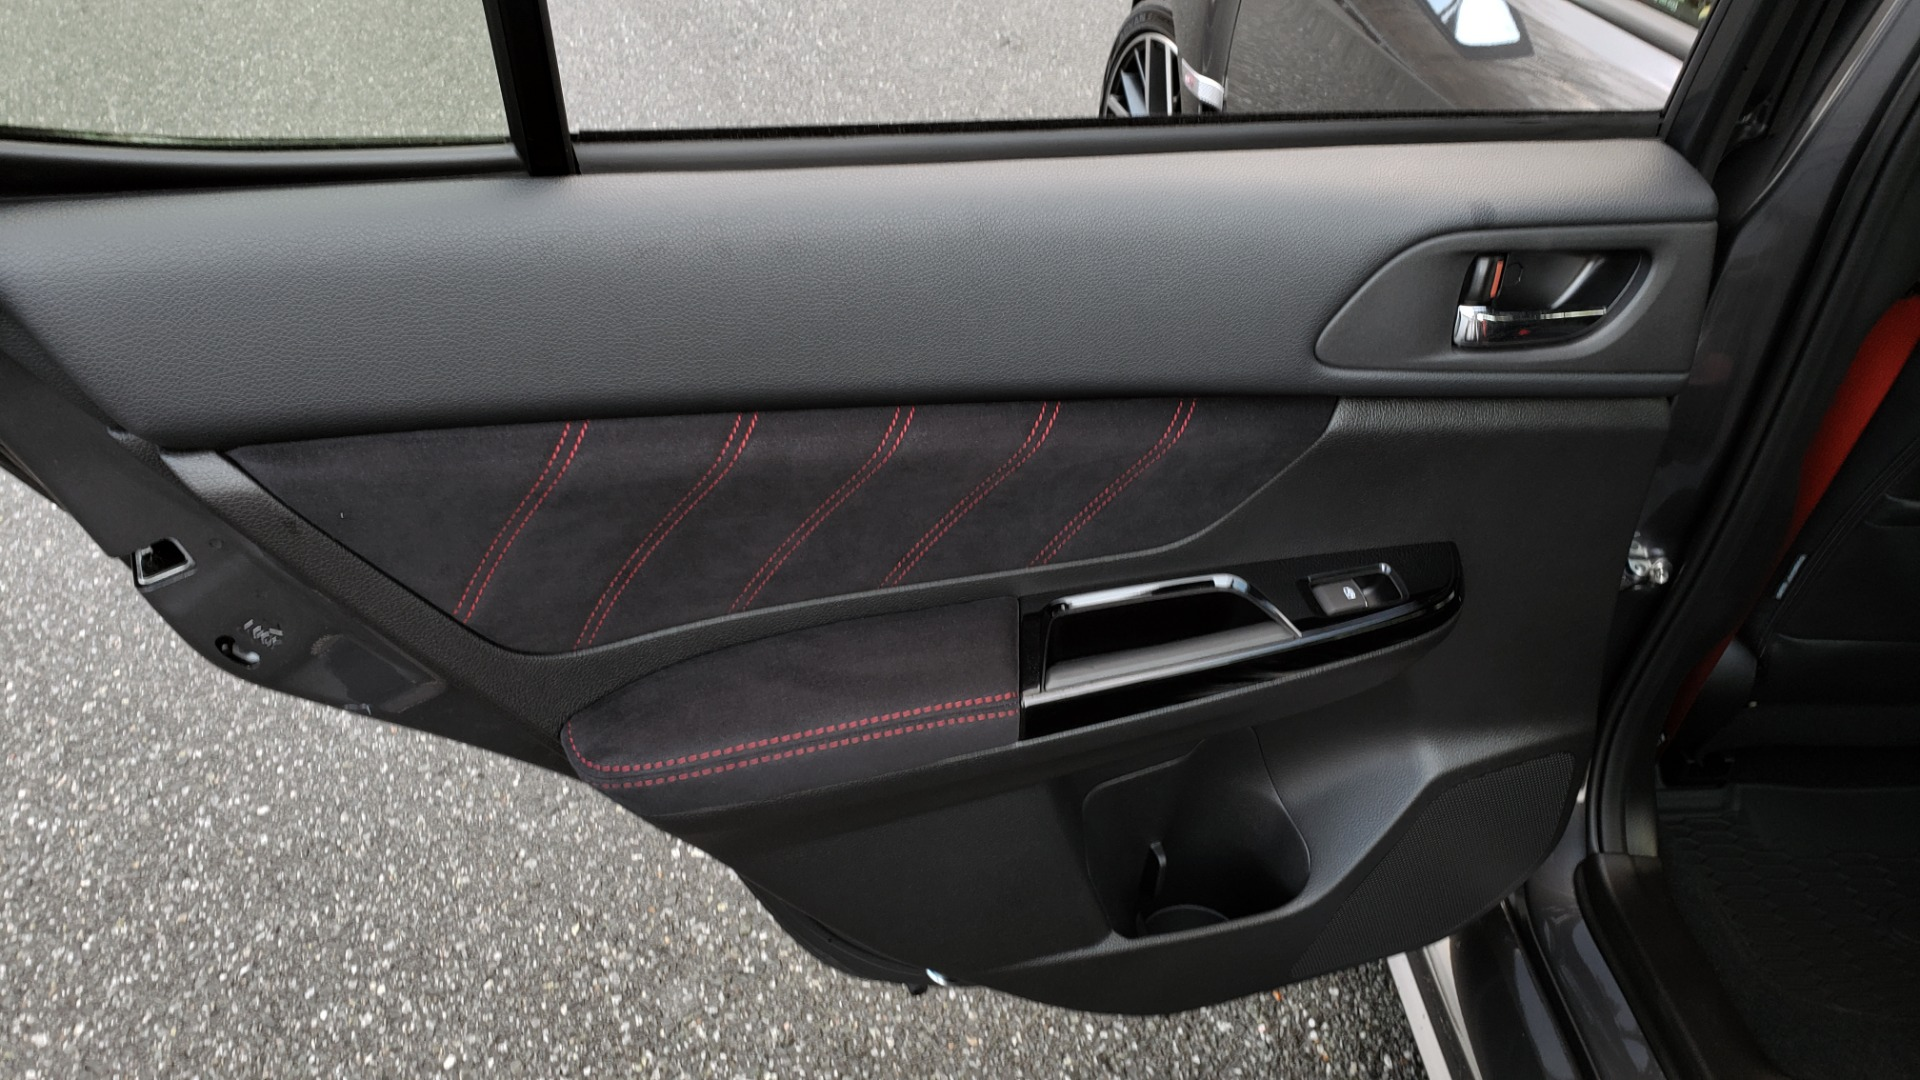 Used 2020 Subaru WRX STI 2.5L TURBO / 6-SPEED MANUAL / RECARO SEATS / REARVIEW for sale Sold at Formula Imports in Charlotte NC 28227 69